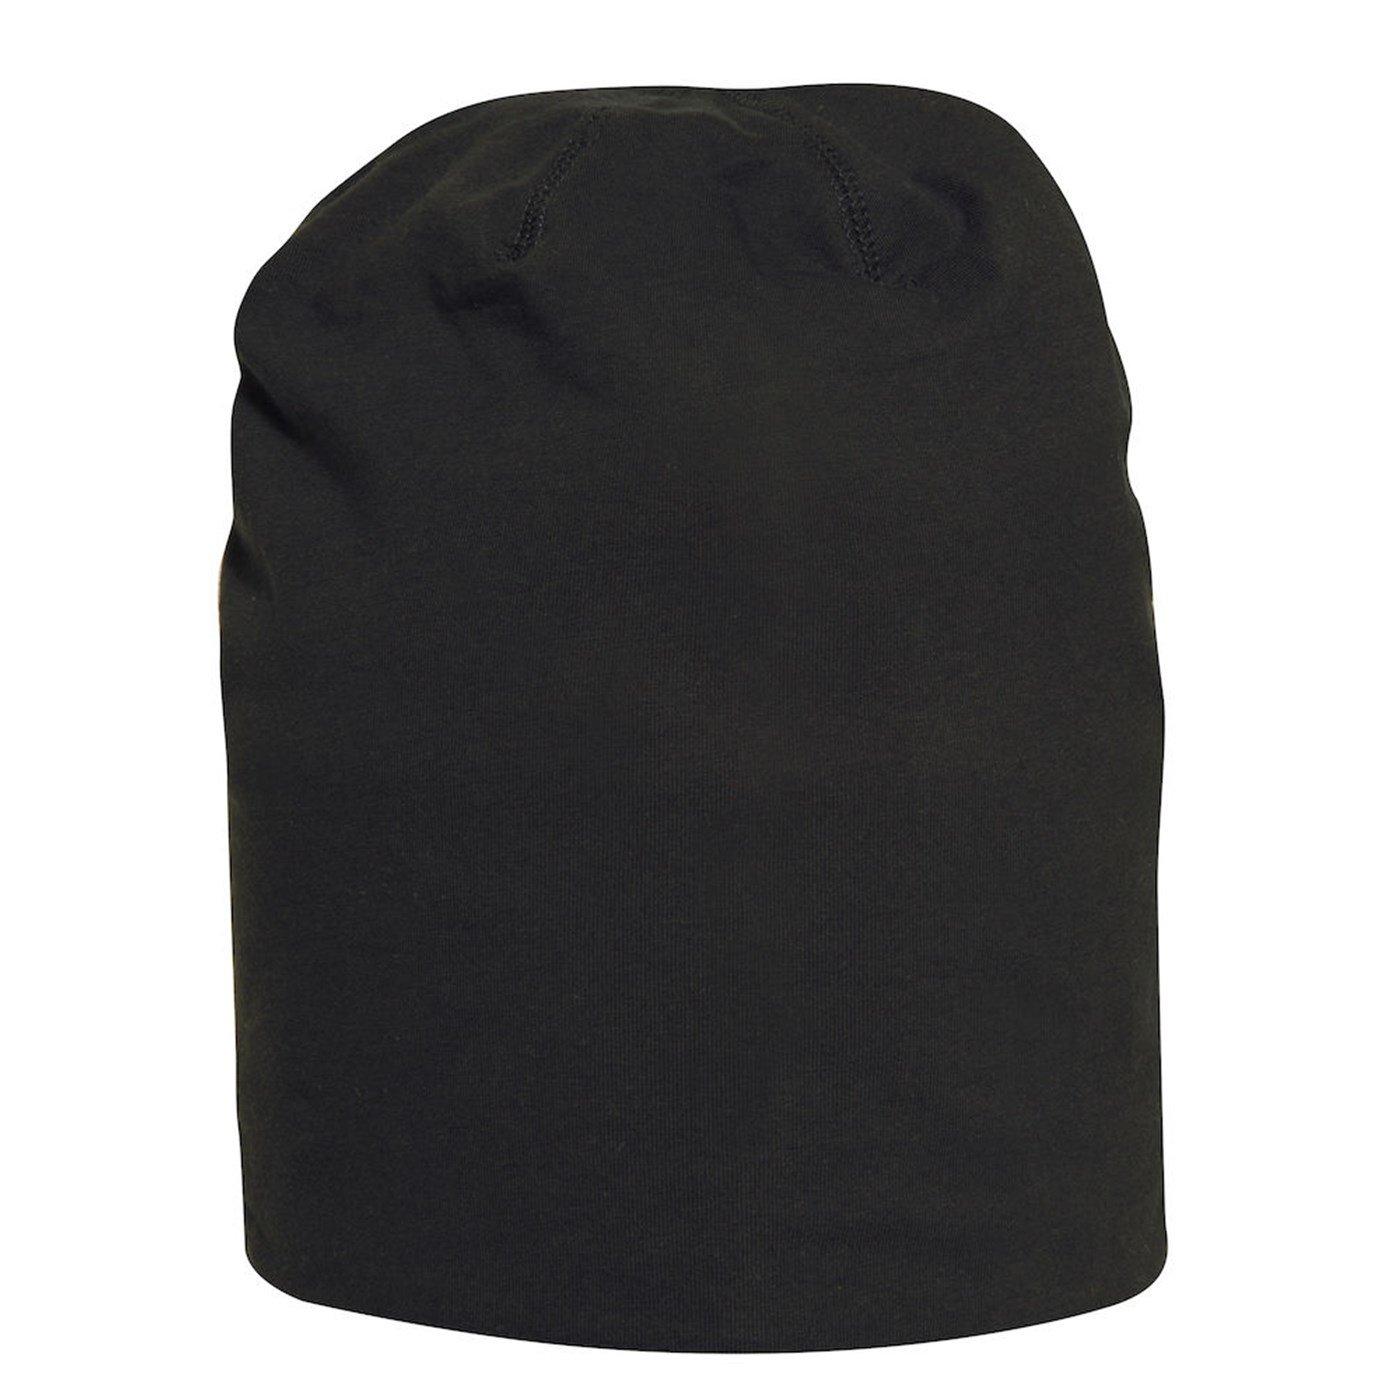 76bd46e686f0b Clique Adult s Saco Jersey Knit Hat